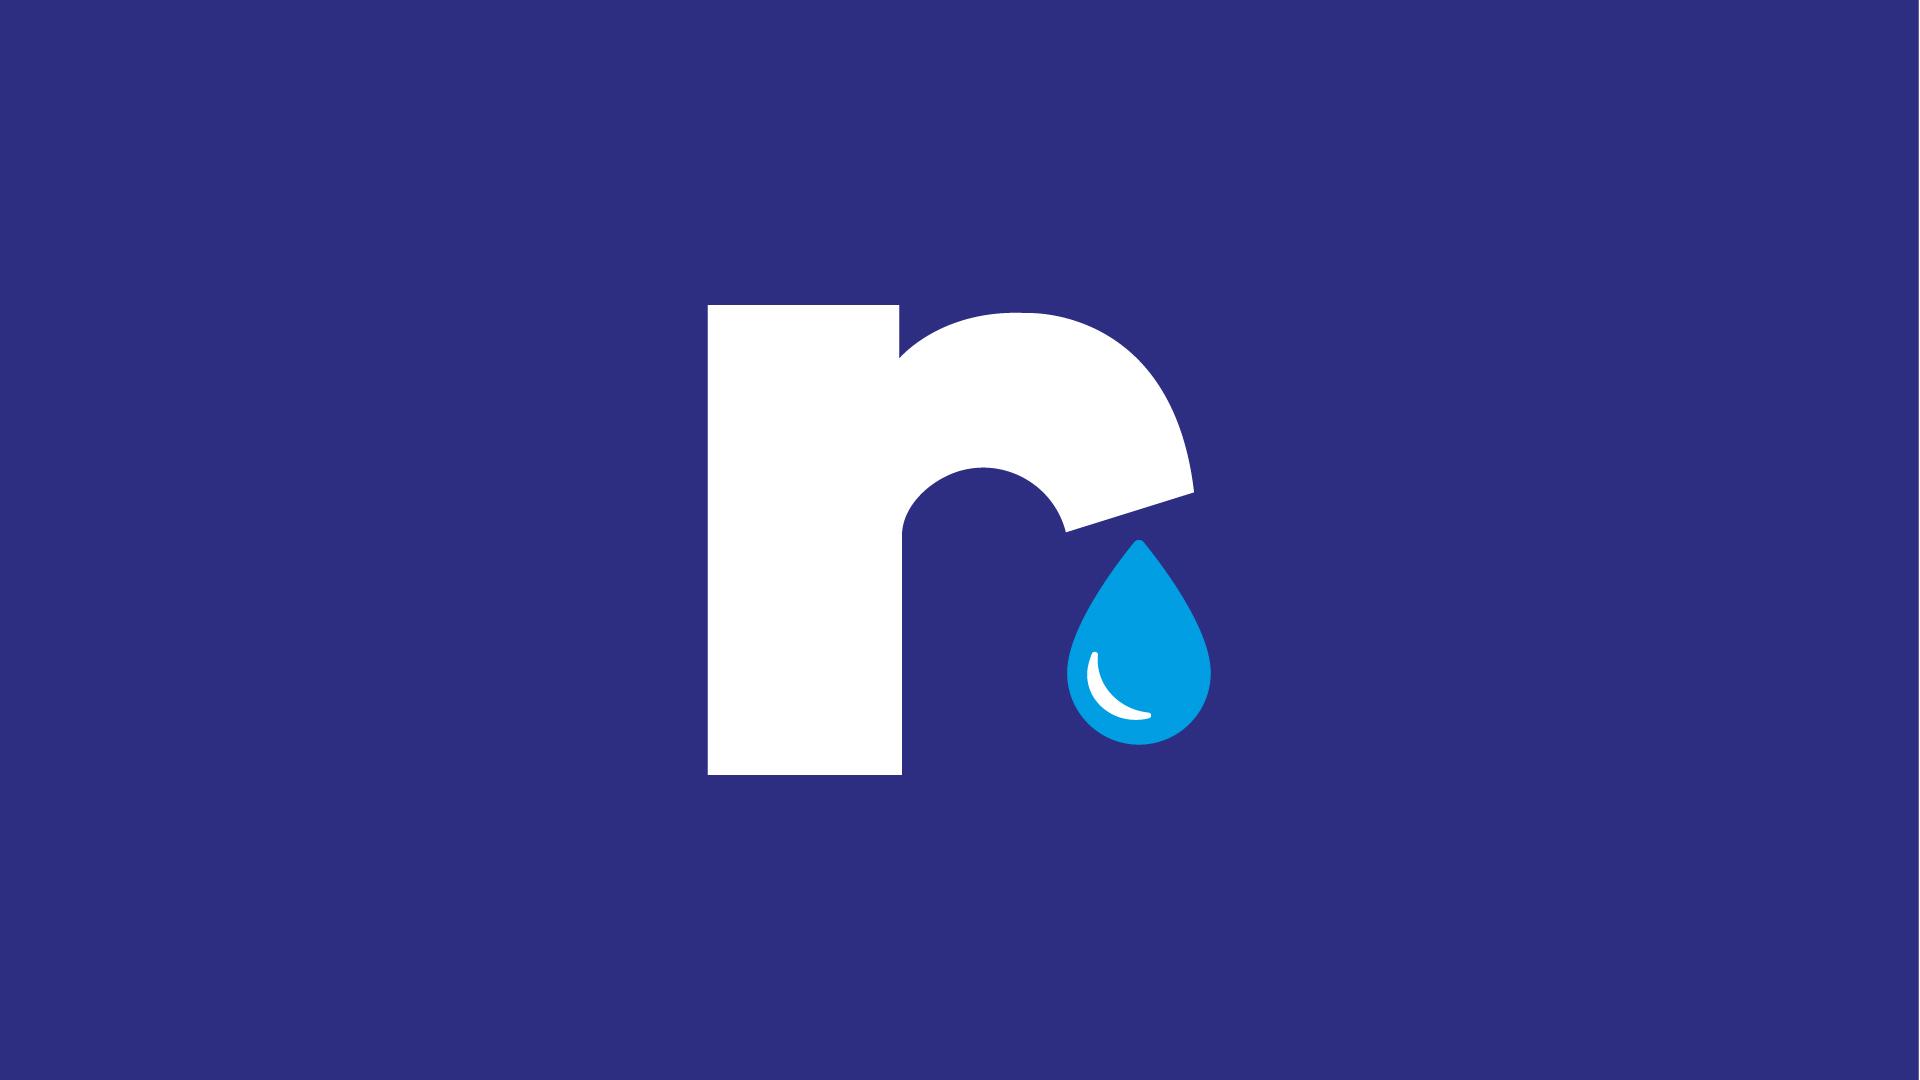 Rikki_Shepherd_Plumbing_Concept_Logo.jpg